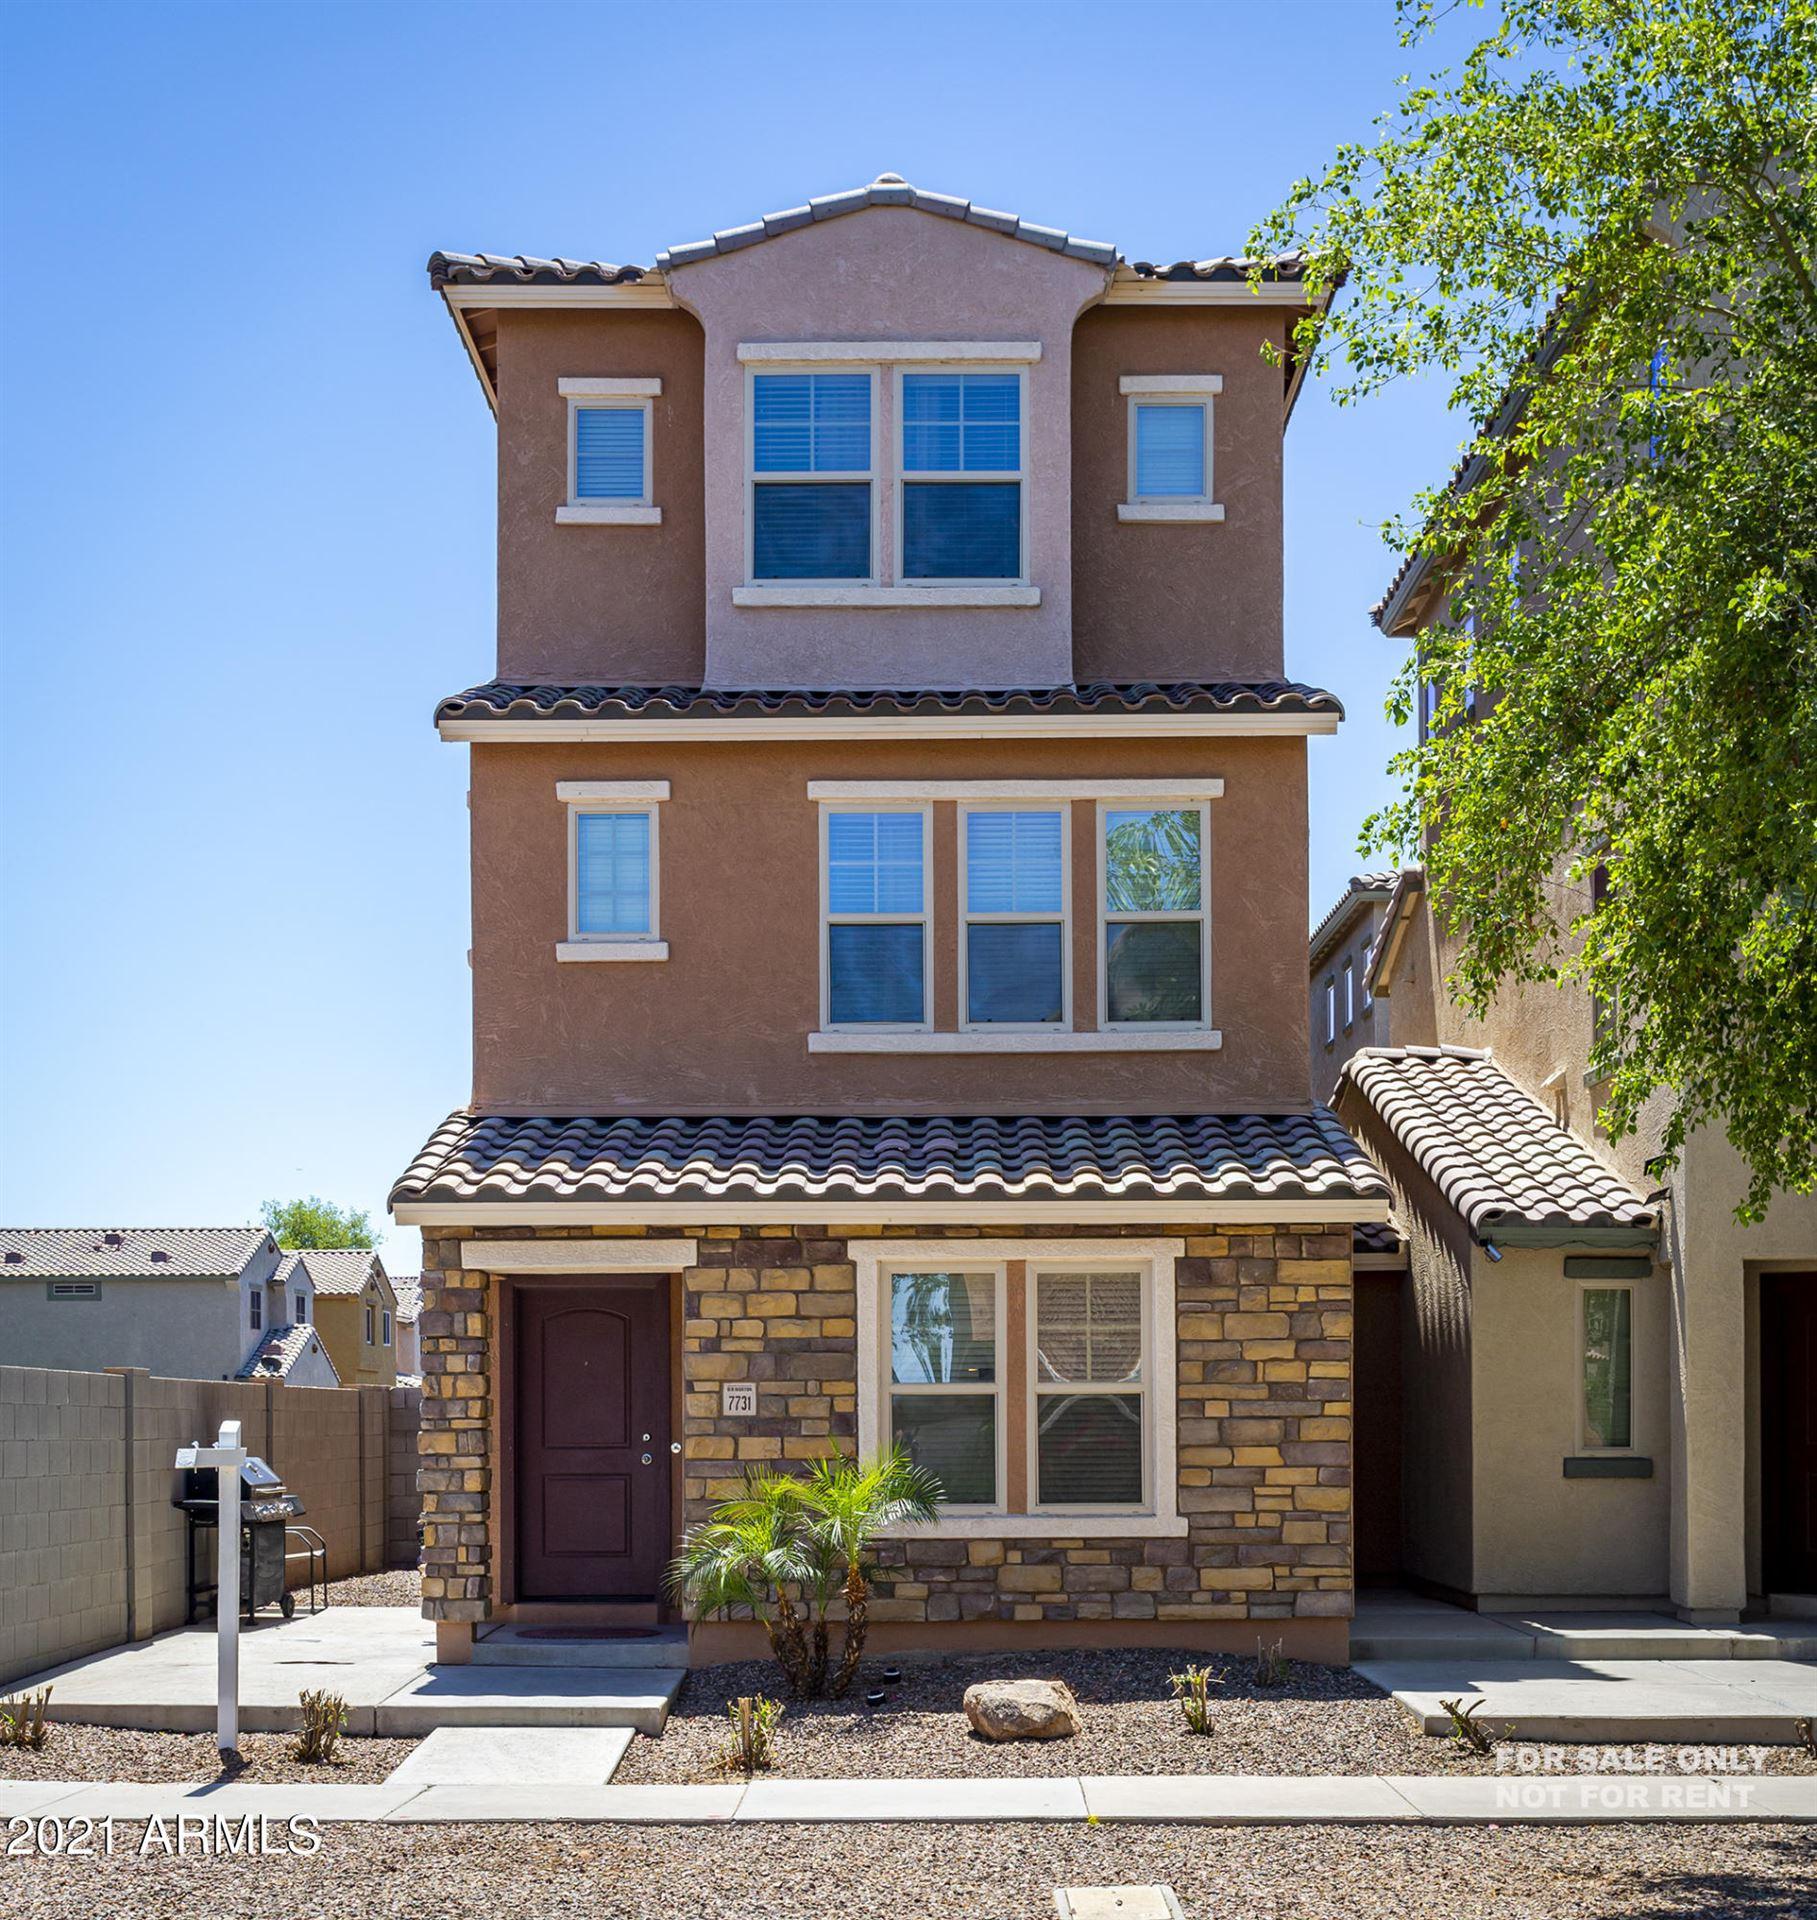 7731 W PIPESTONE Place, Phoenix, AZ 85035 - MLS#: 6232403